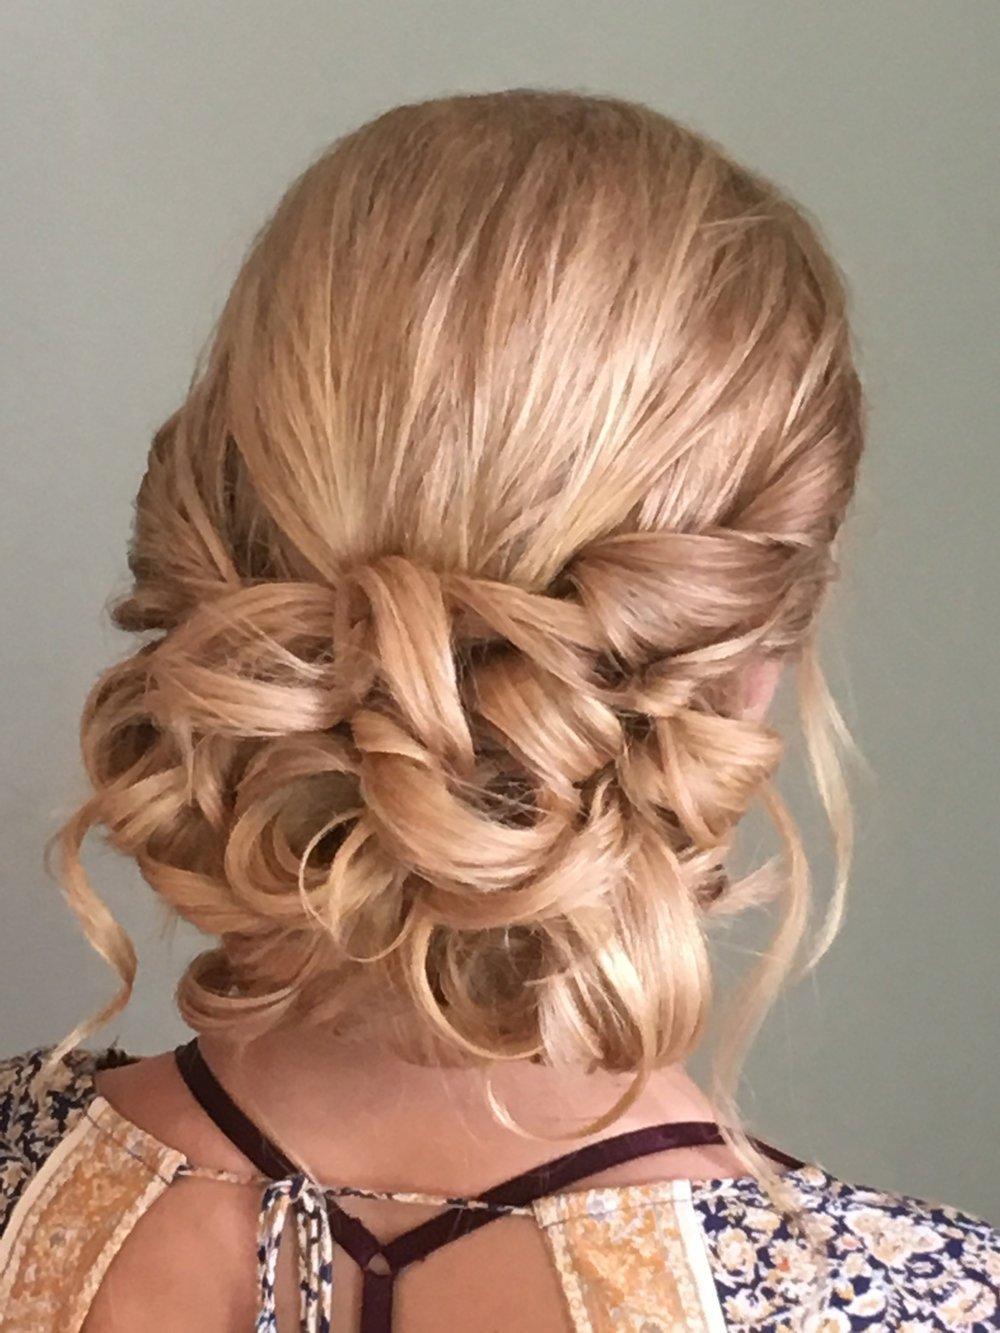 Blonde updo style Davines | Lari Manz Hair and Makeup